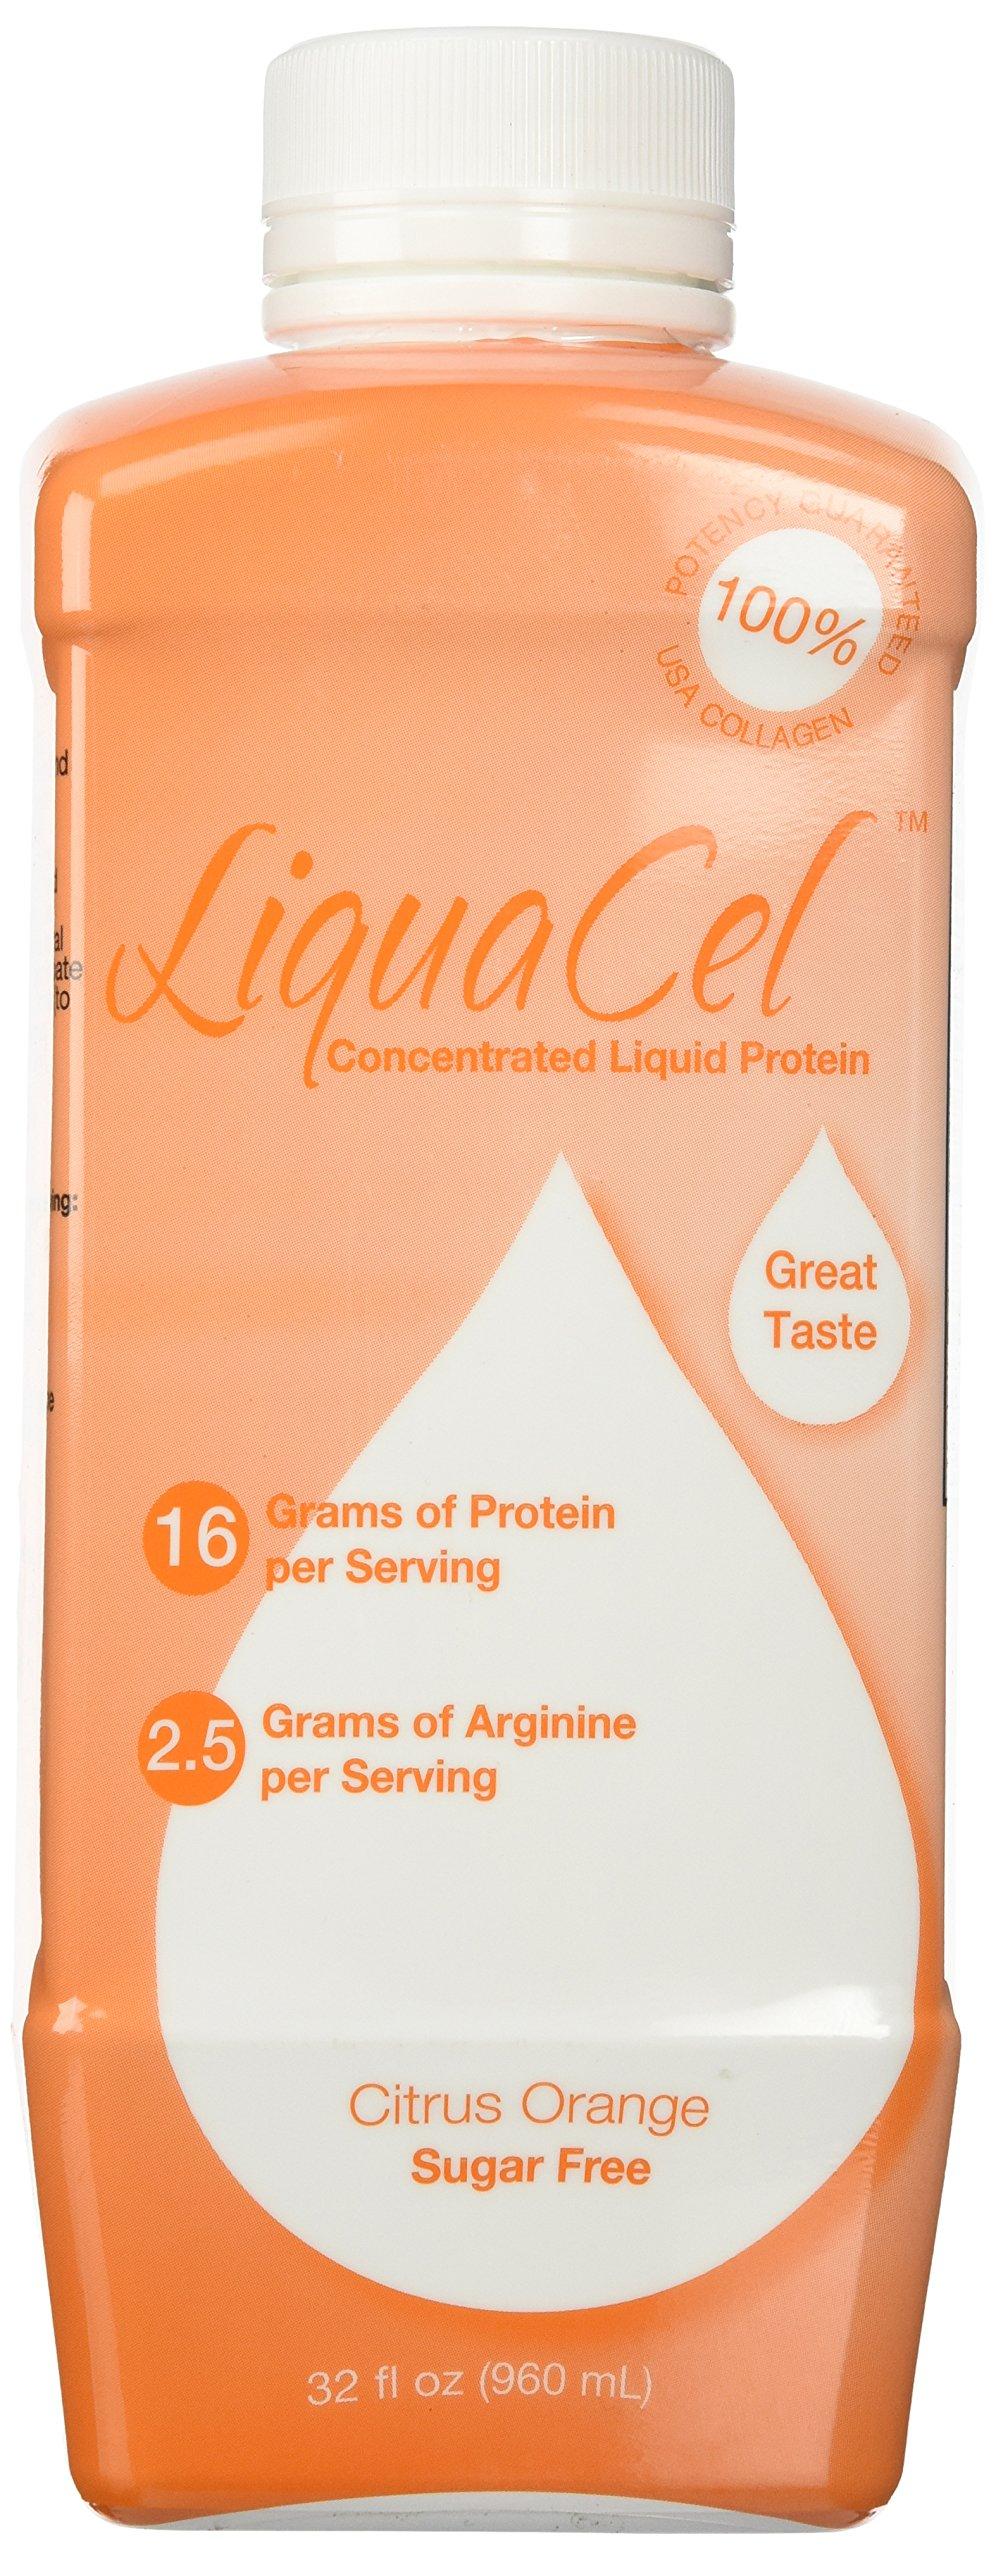 Liquacel Liquid Protein Sugar Free 32oz Orange Flavor by Global Healing